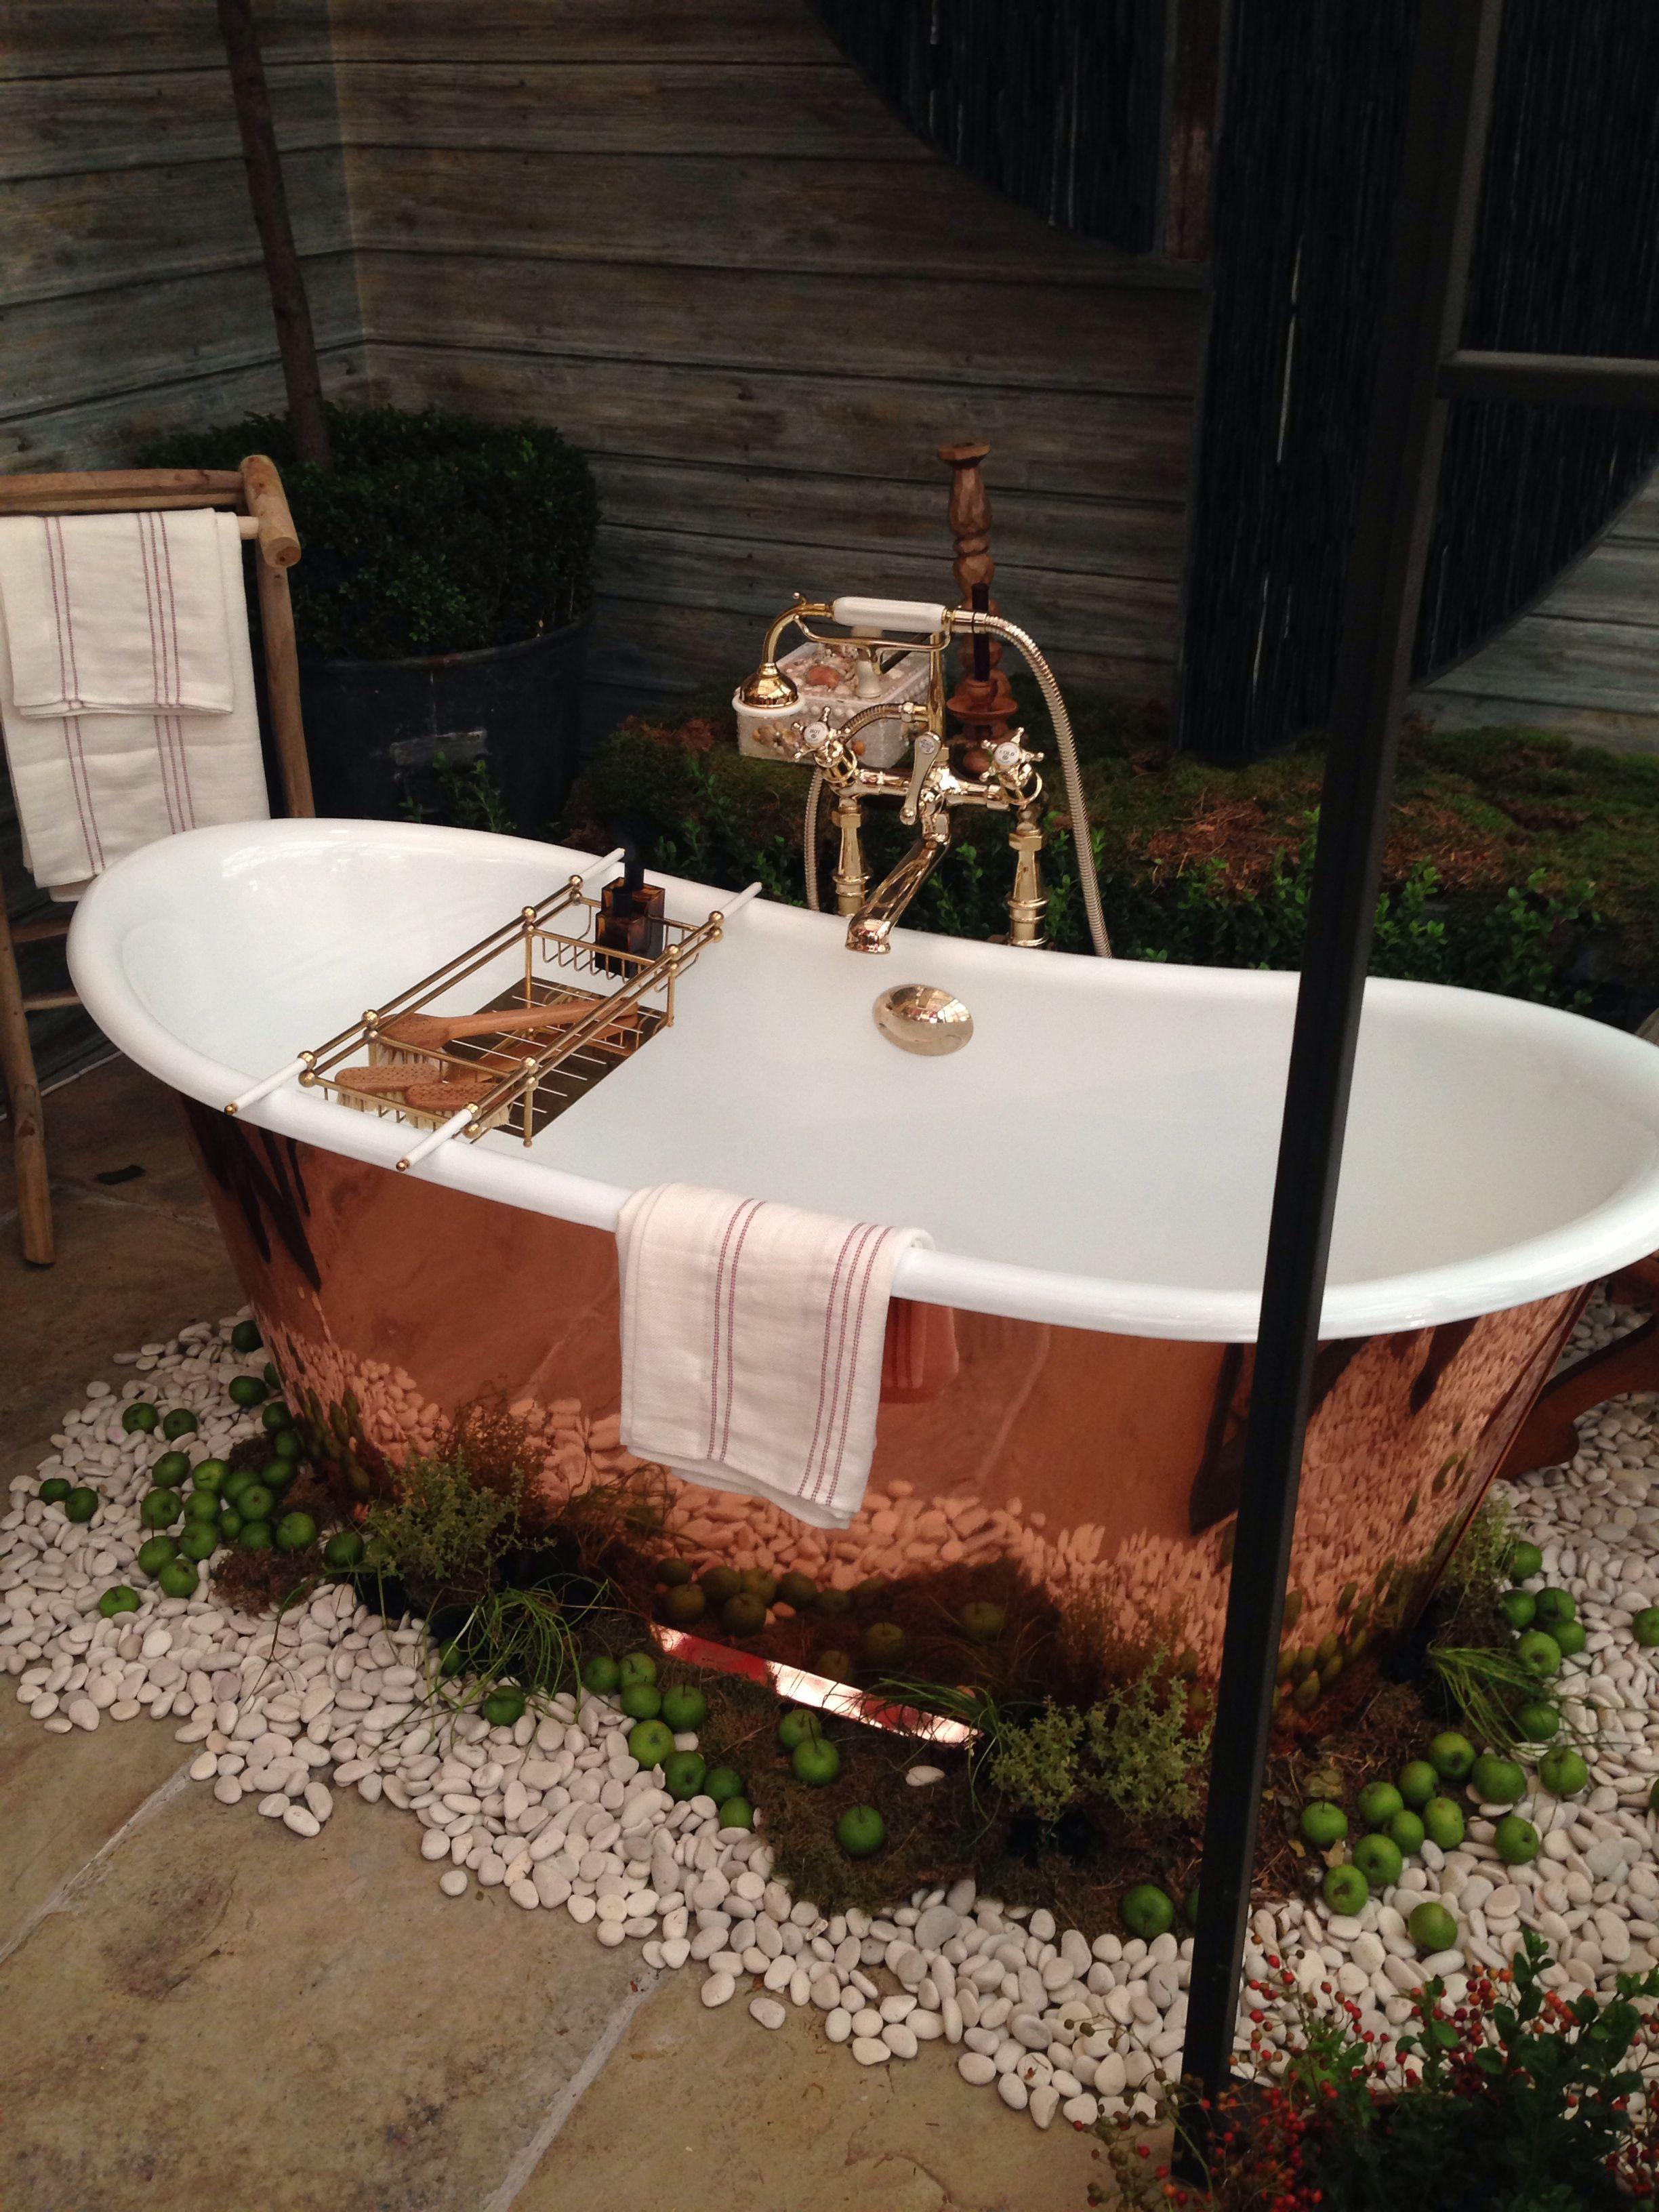 Copper Tub Sits In An Outside Garden Bathroom So Pretty Aussenbad Haus Deko Wohnideen